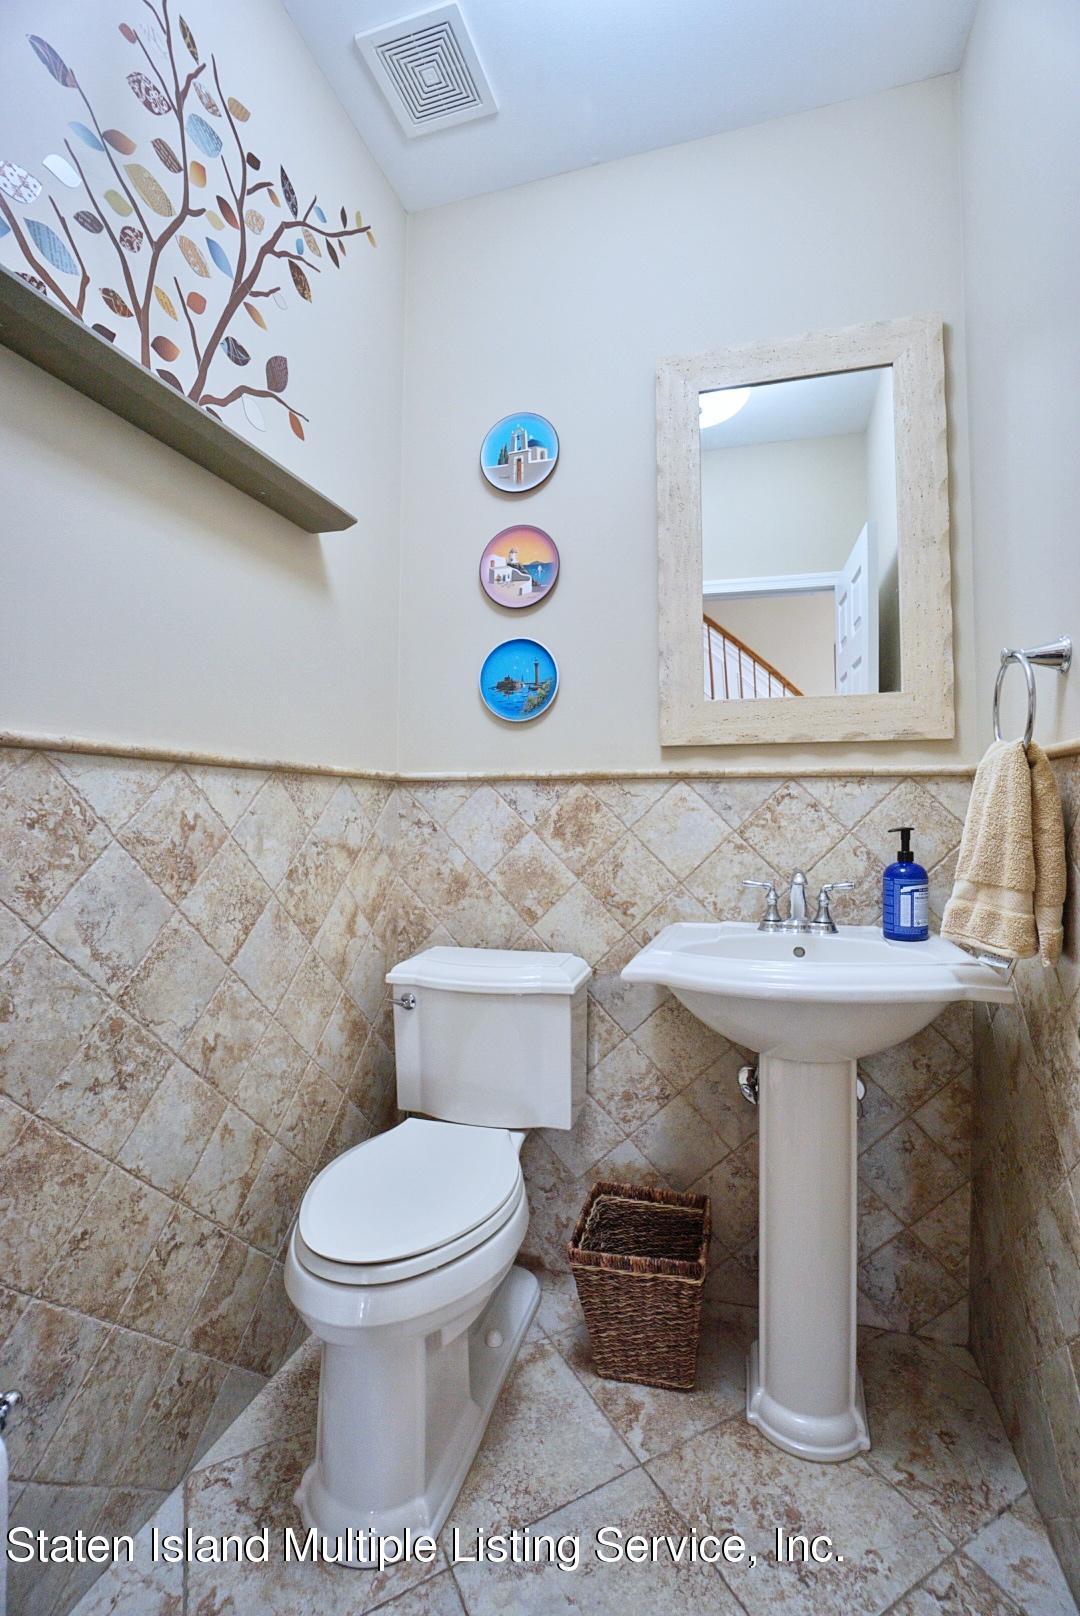 Single Family - Detached 31 Belwood Loop  Staten Island, NY 10307, MLS-1143133-13